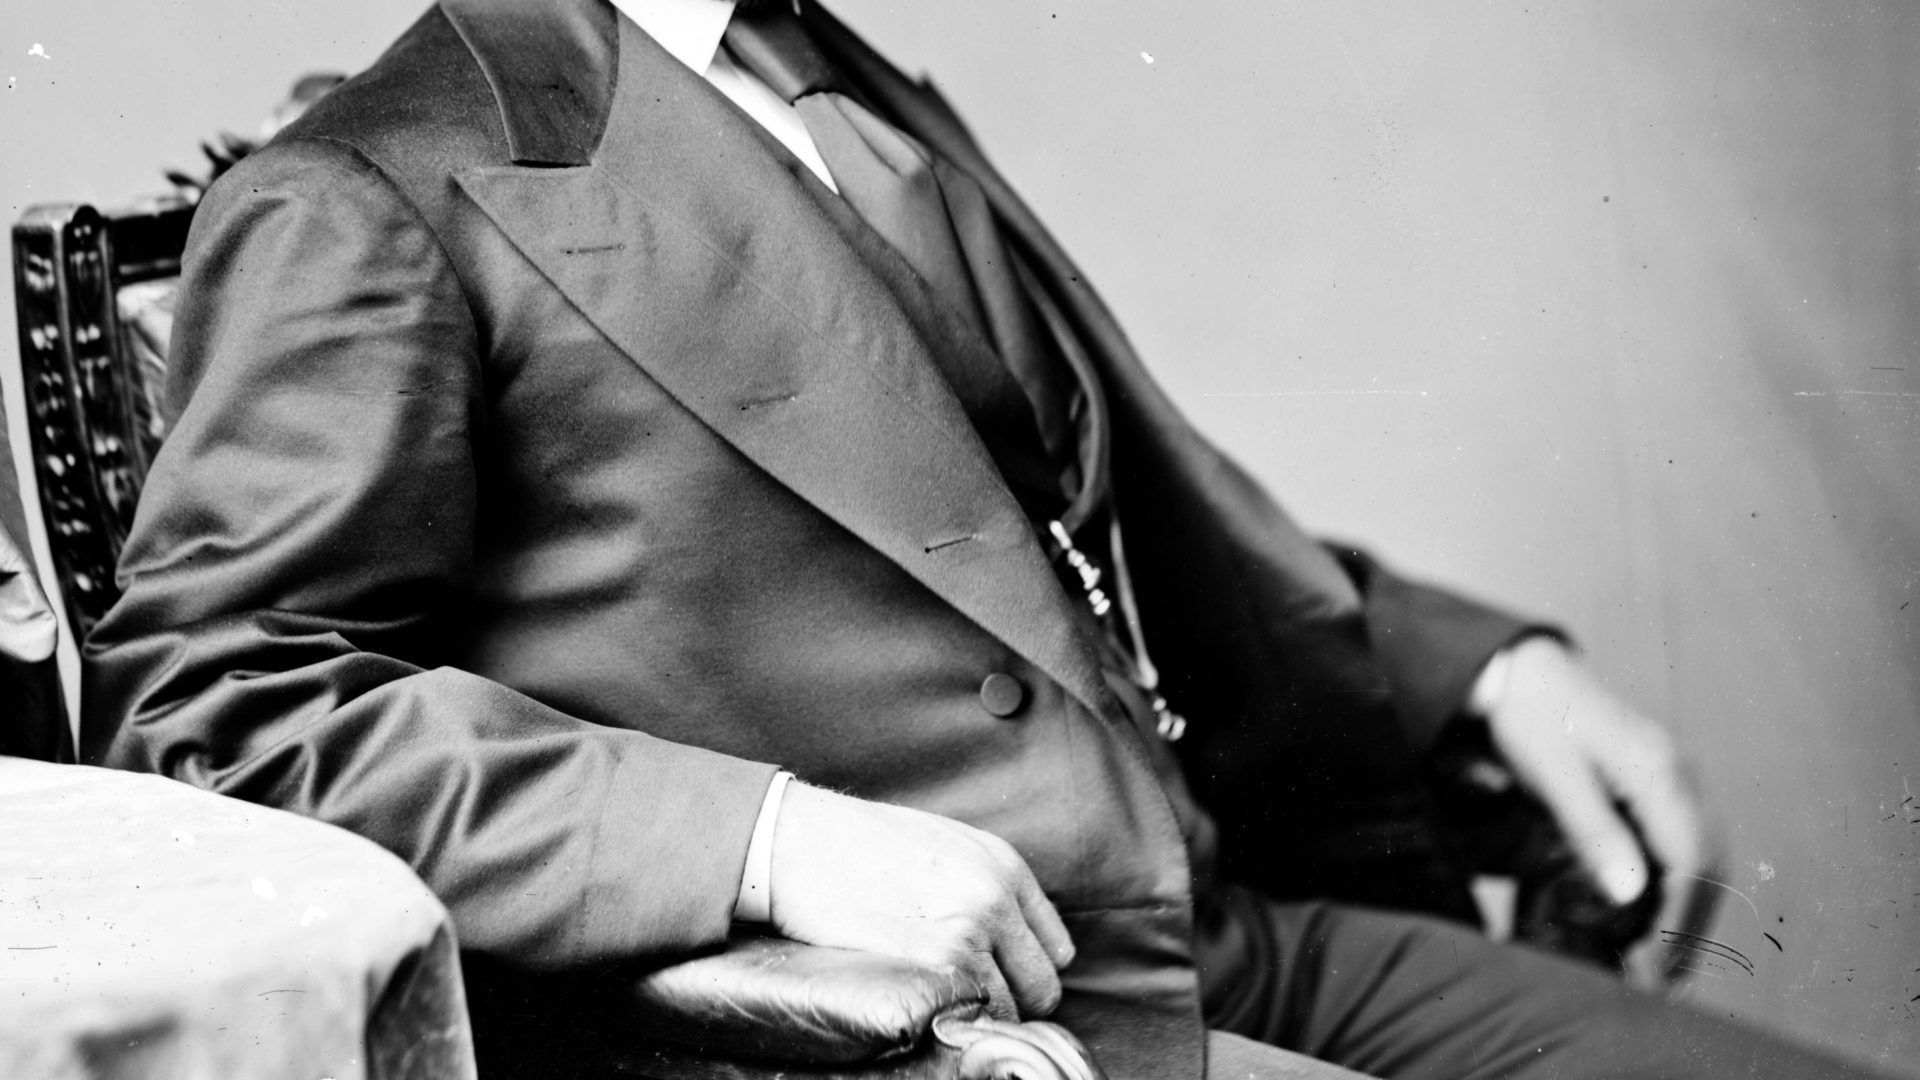 Hiram Rhoades Revels, First Black U.S. Senator